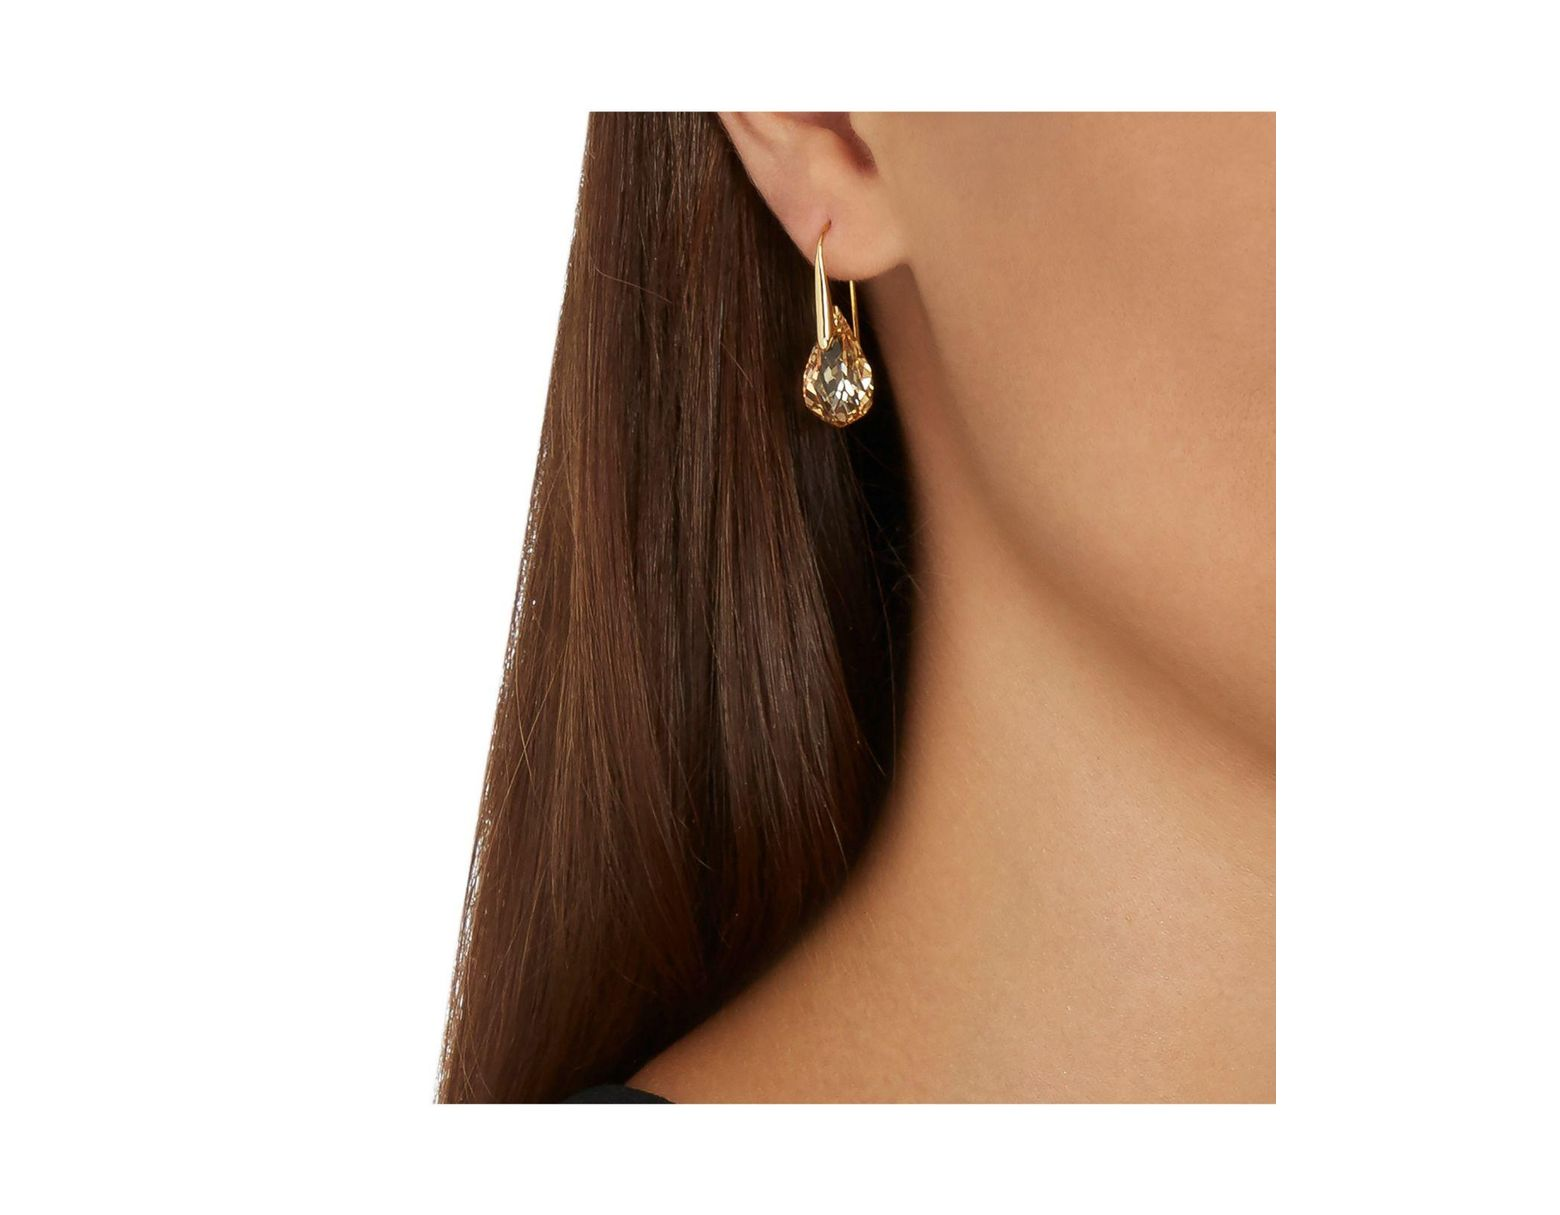 1c43db174 Swarovski Energic Earrings in Metallic - Save 30% - Lyst